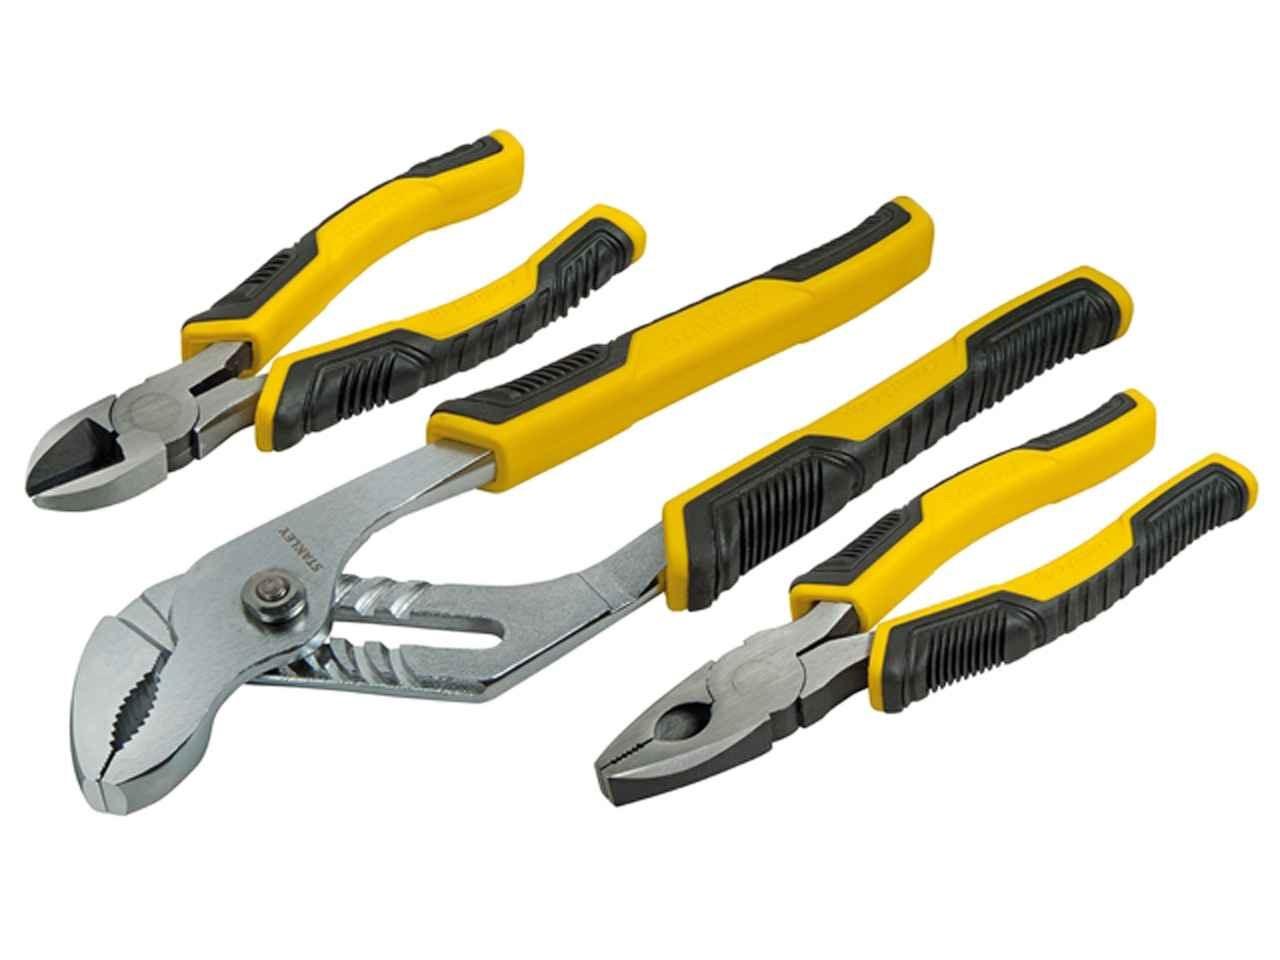 stanley sta074471 control grip plier set of 3